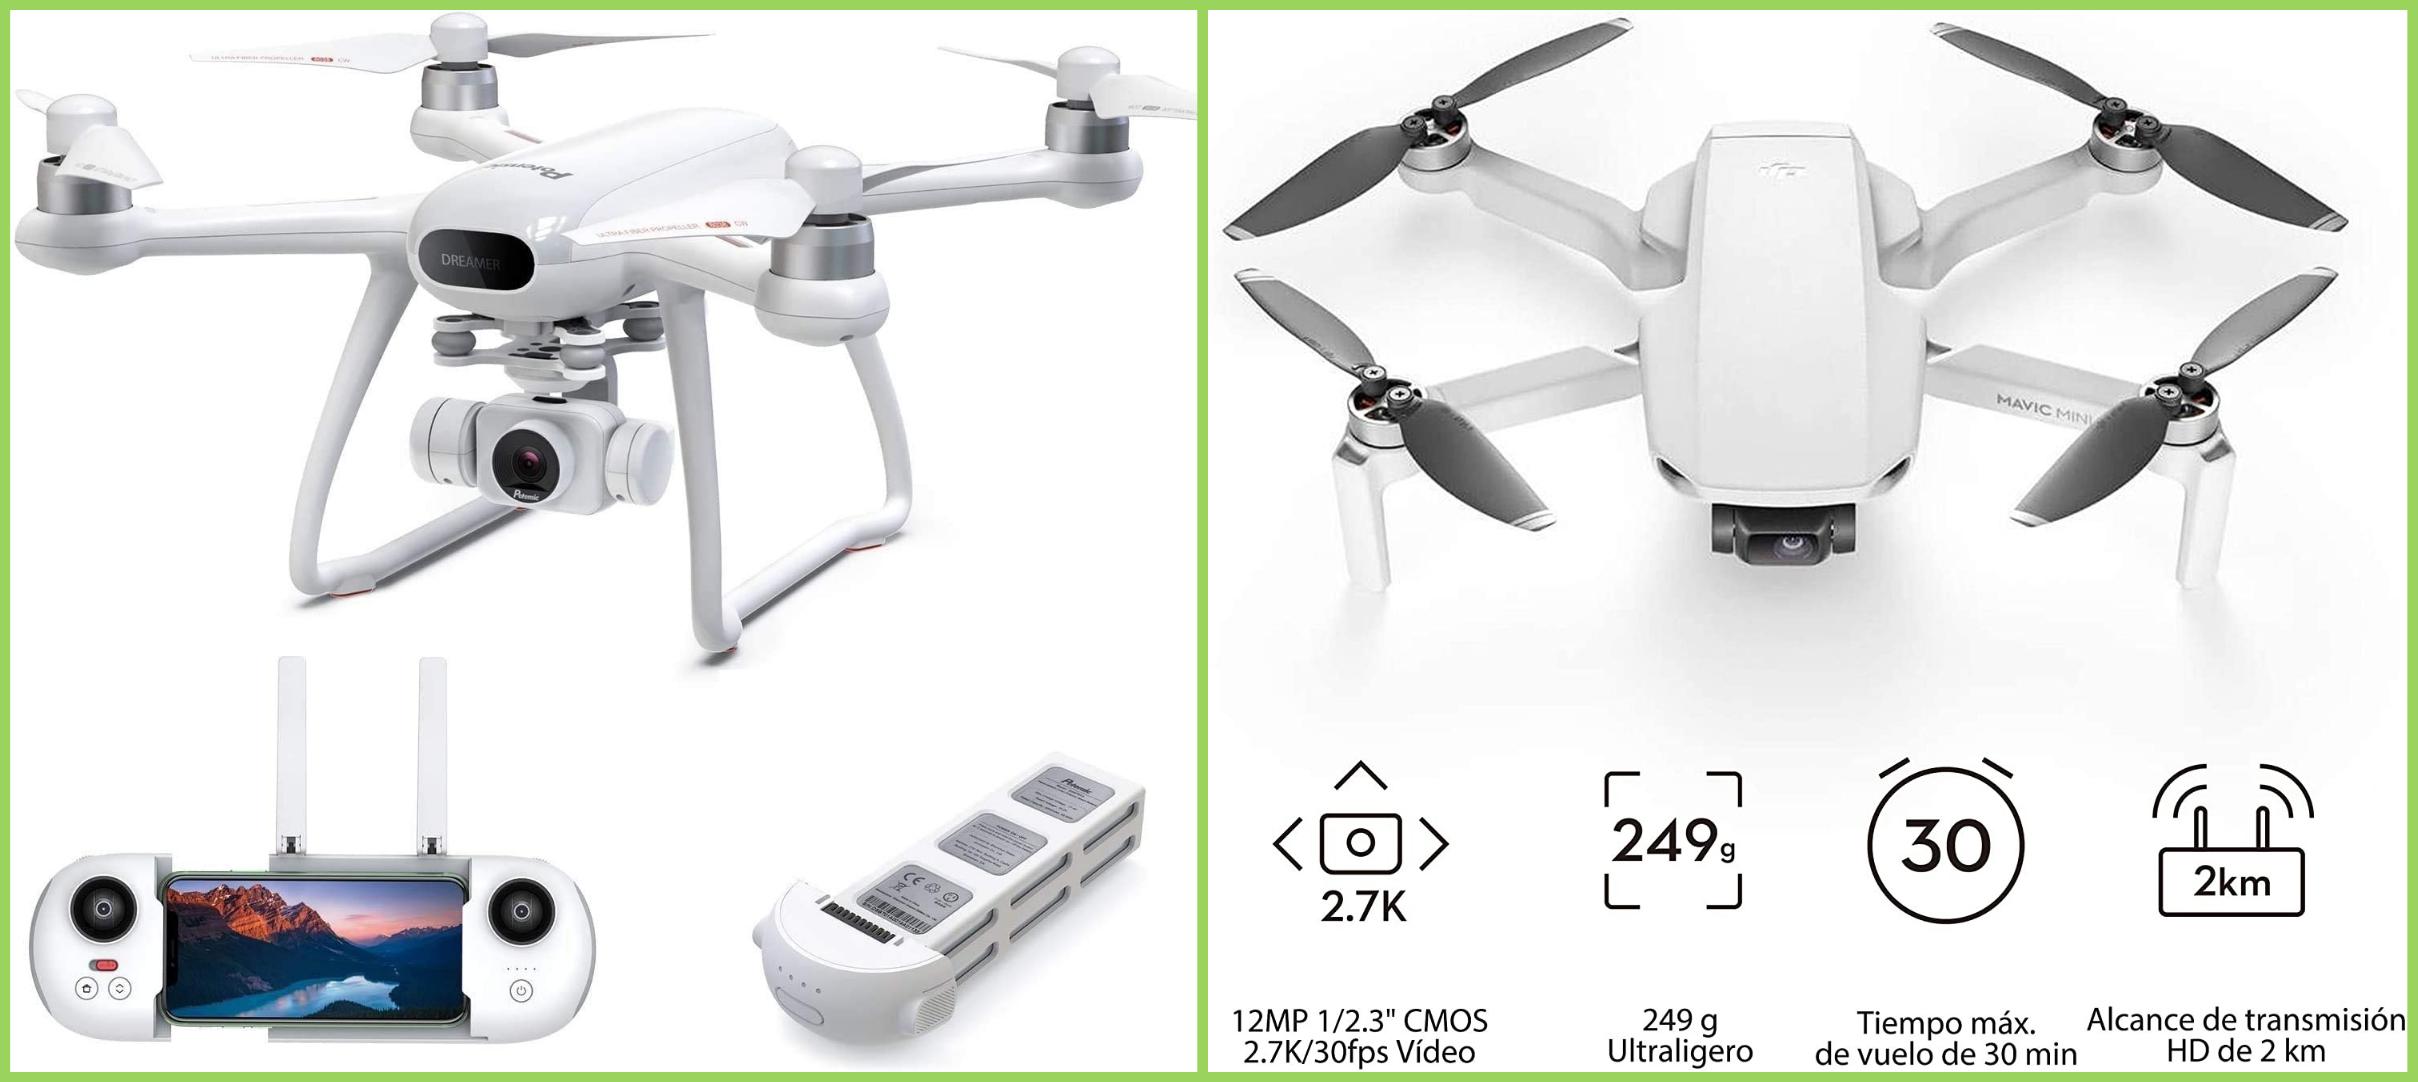 Potensic vs DJI, ¿Cuál es el mejor drone 2021?